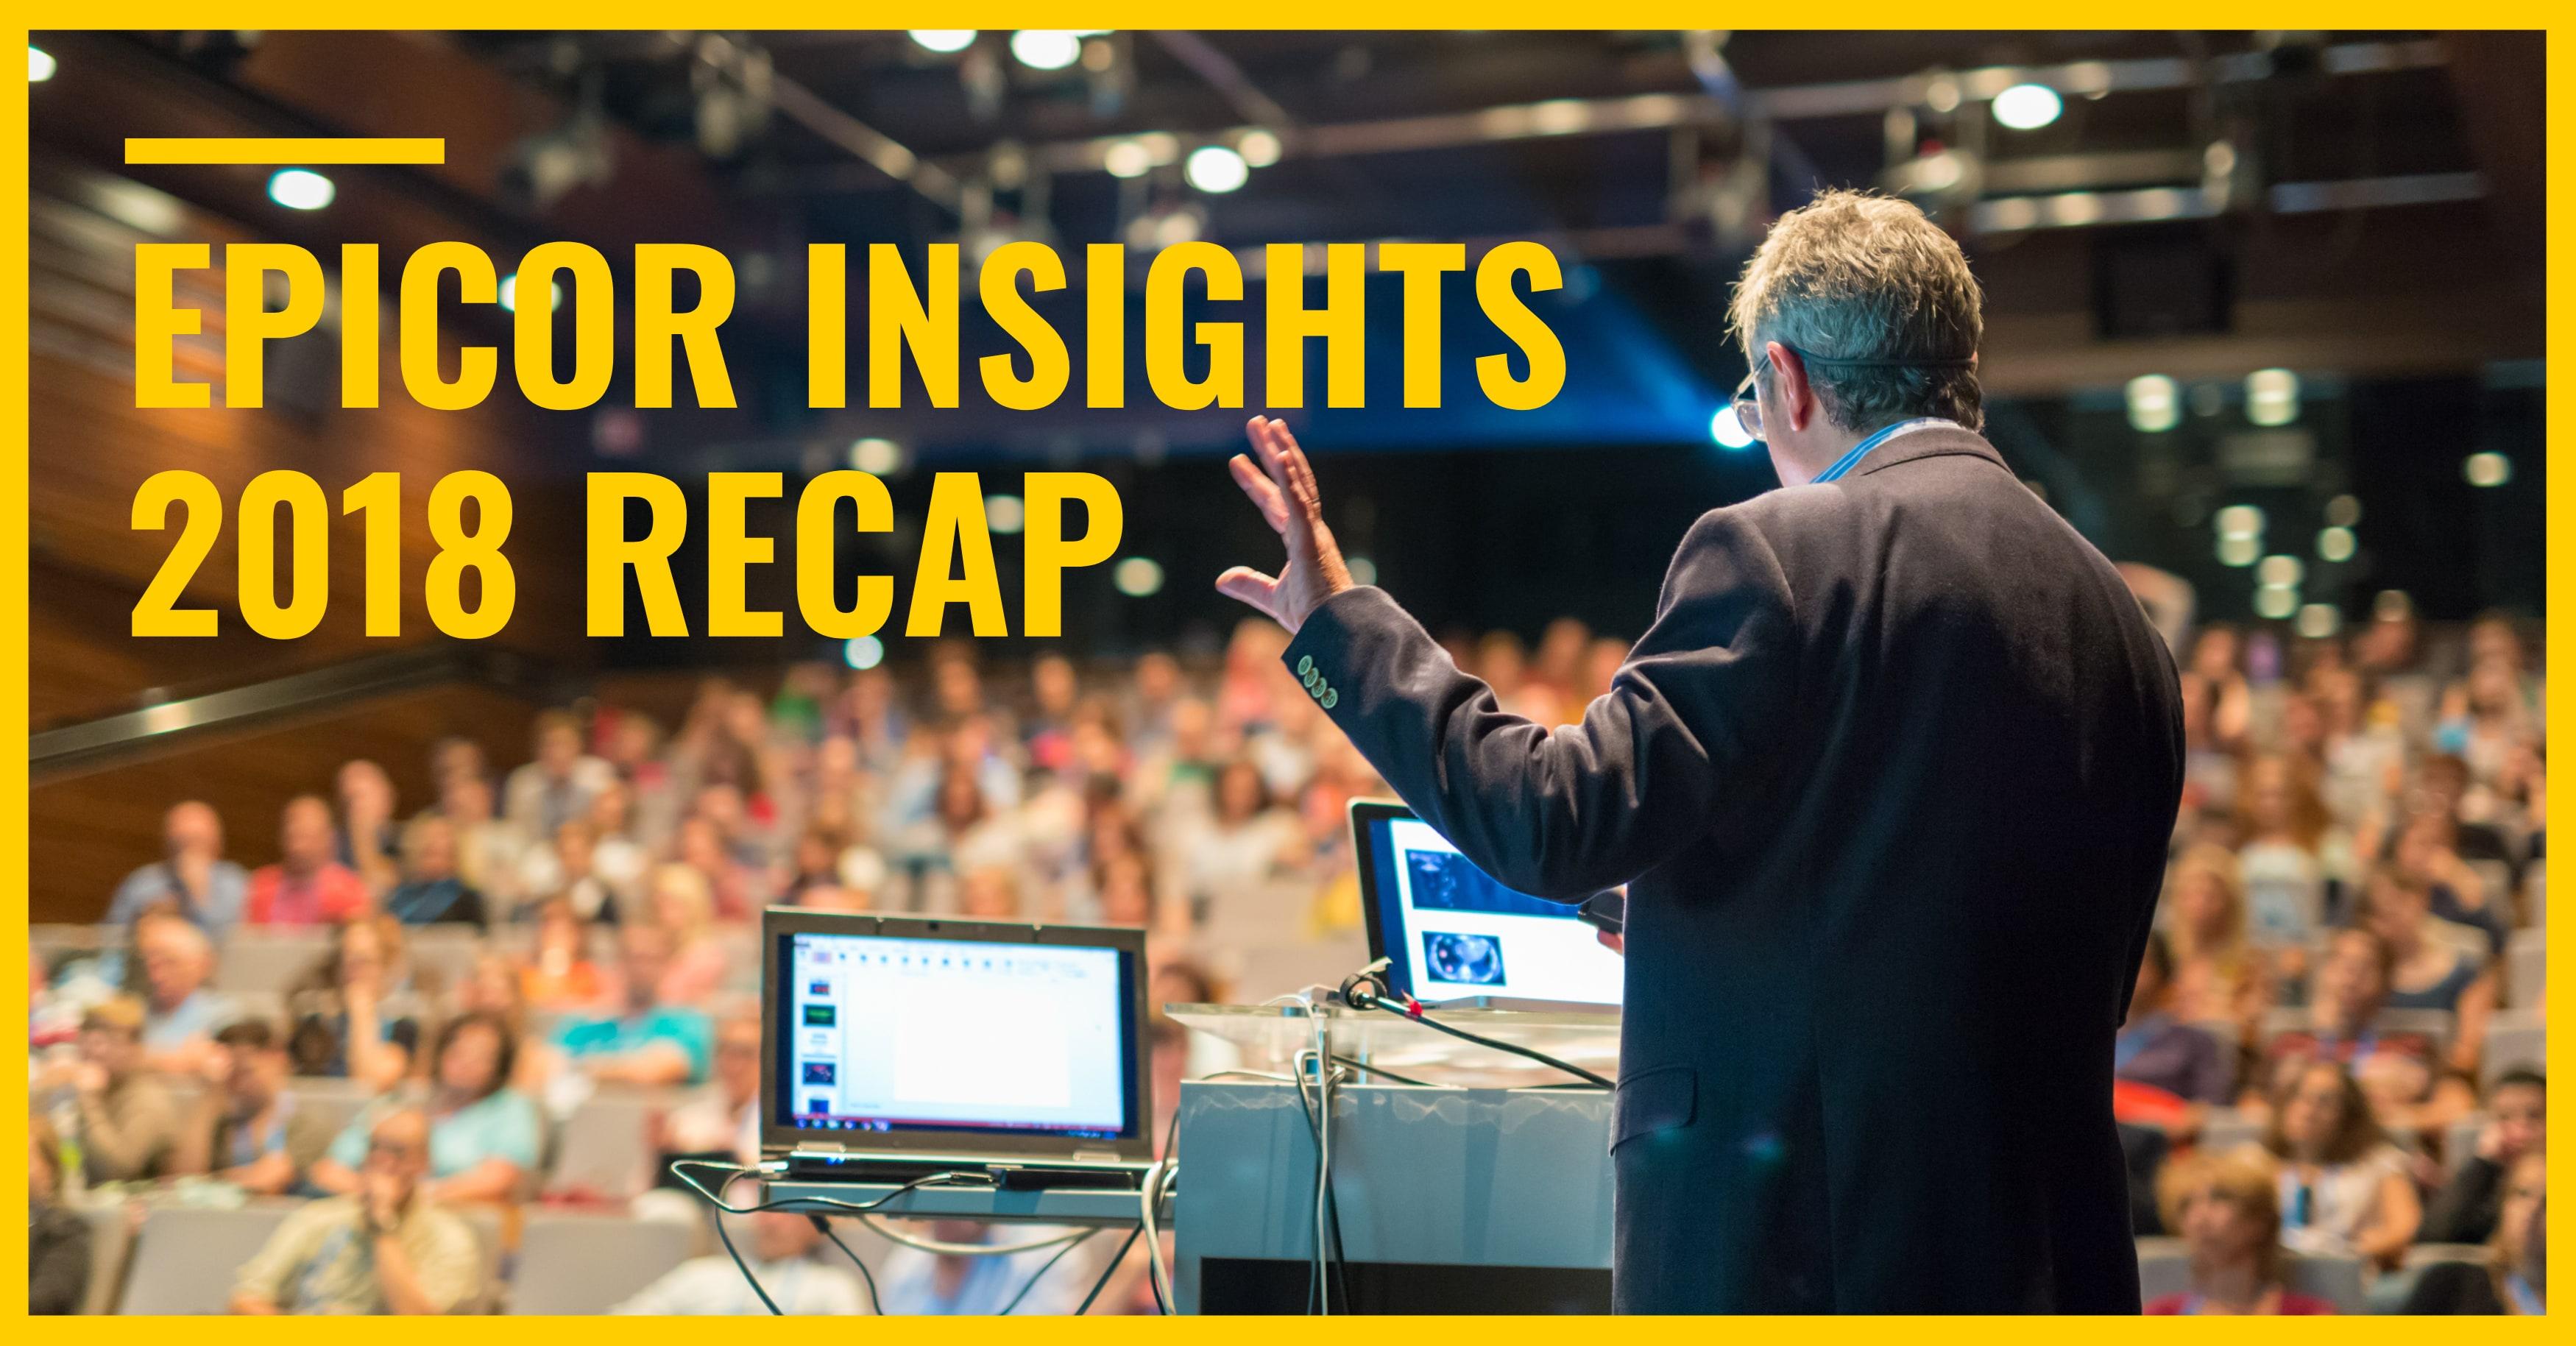 Epicor Insights 2018